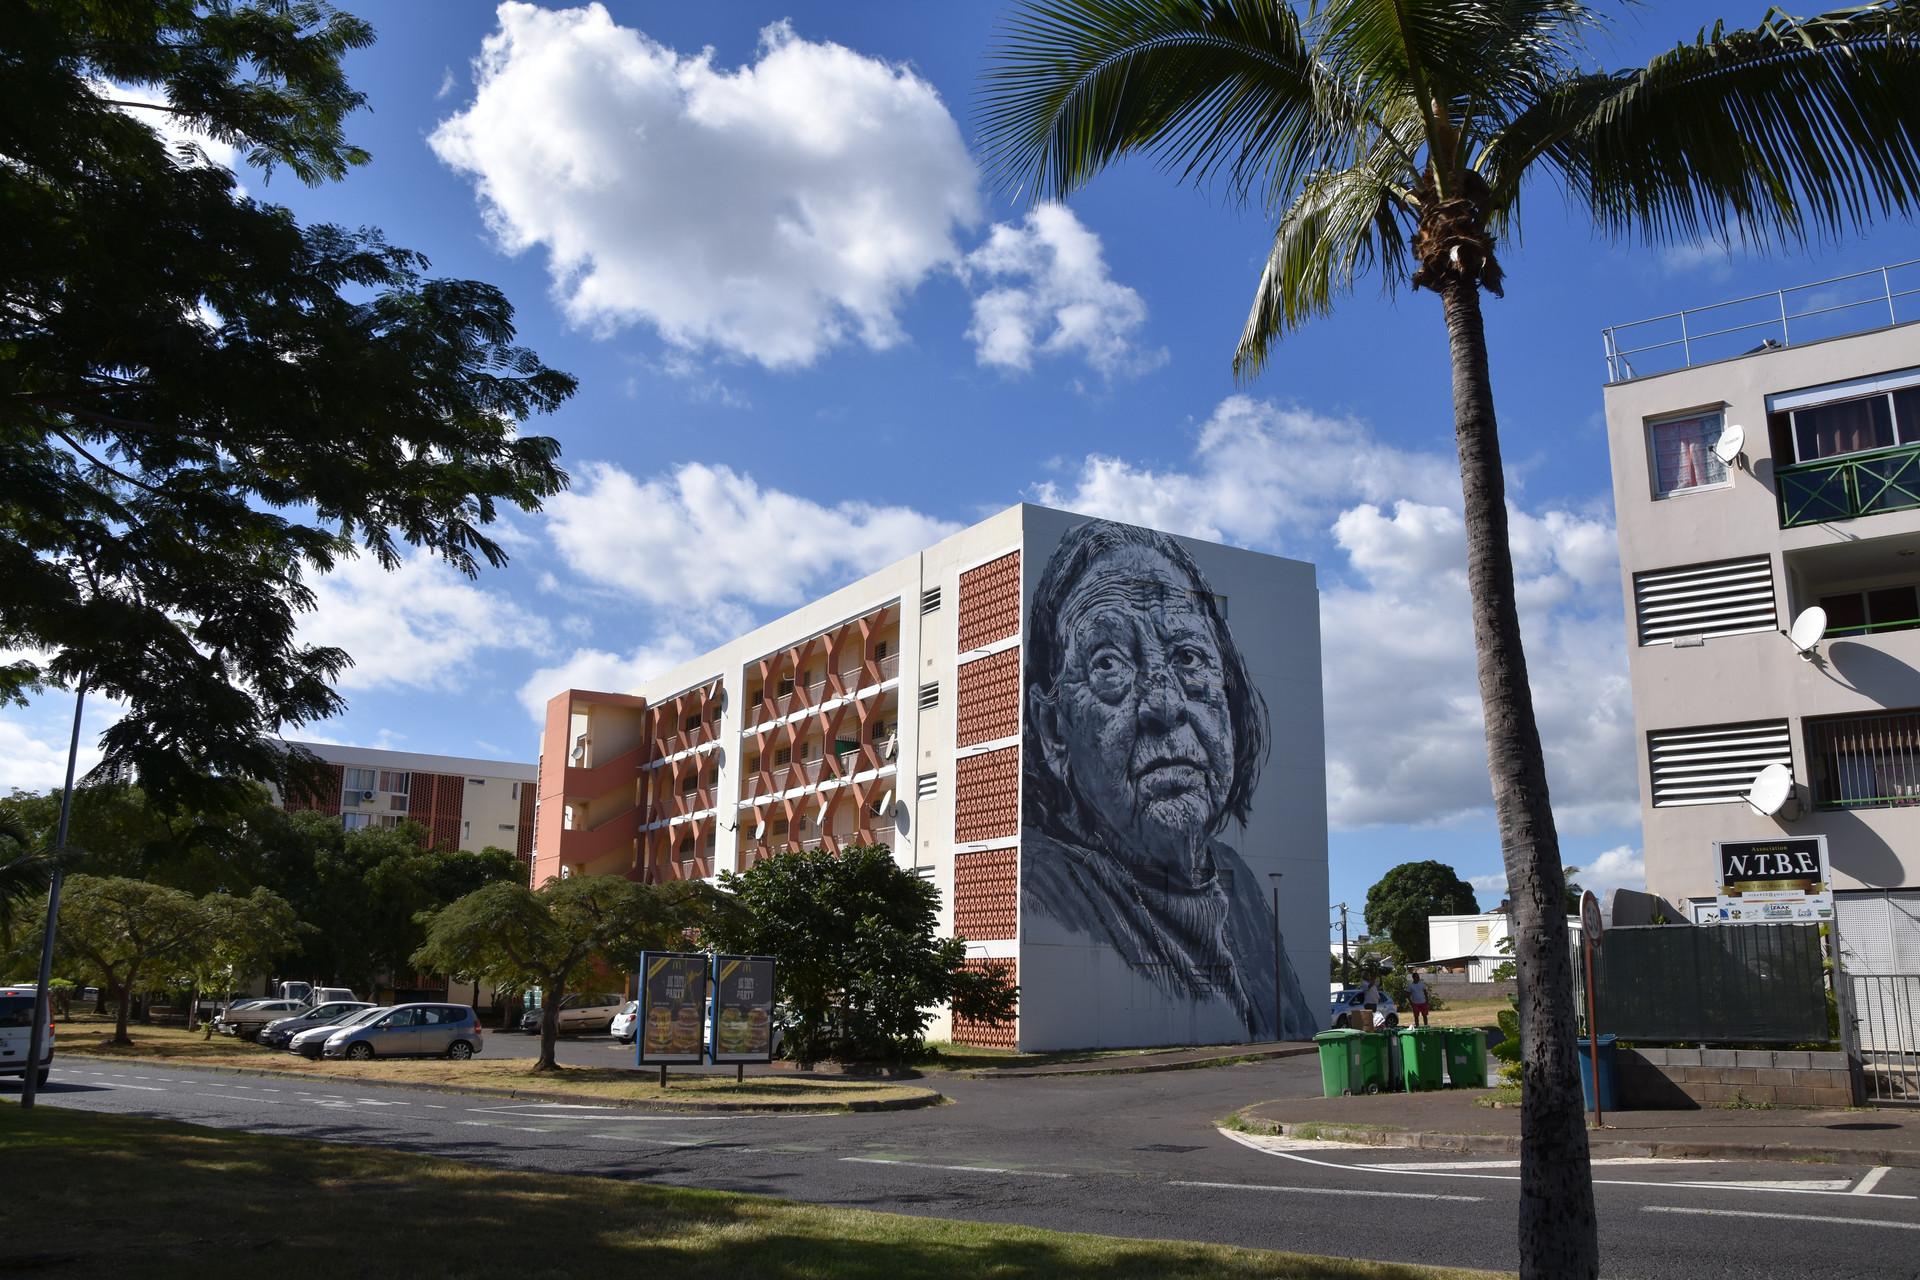 ECB - street art